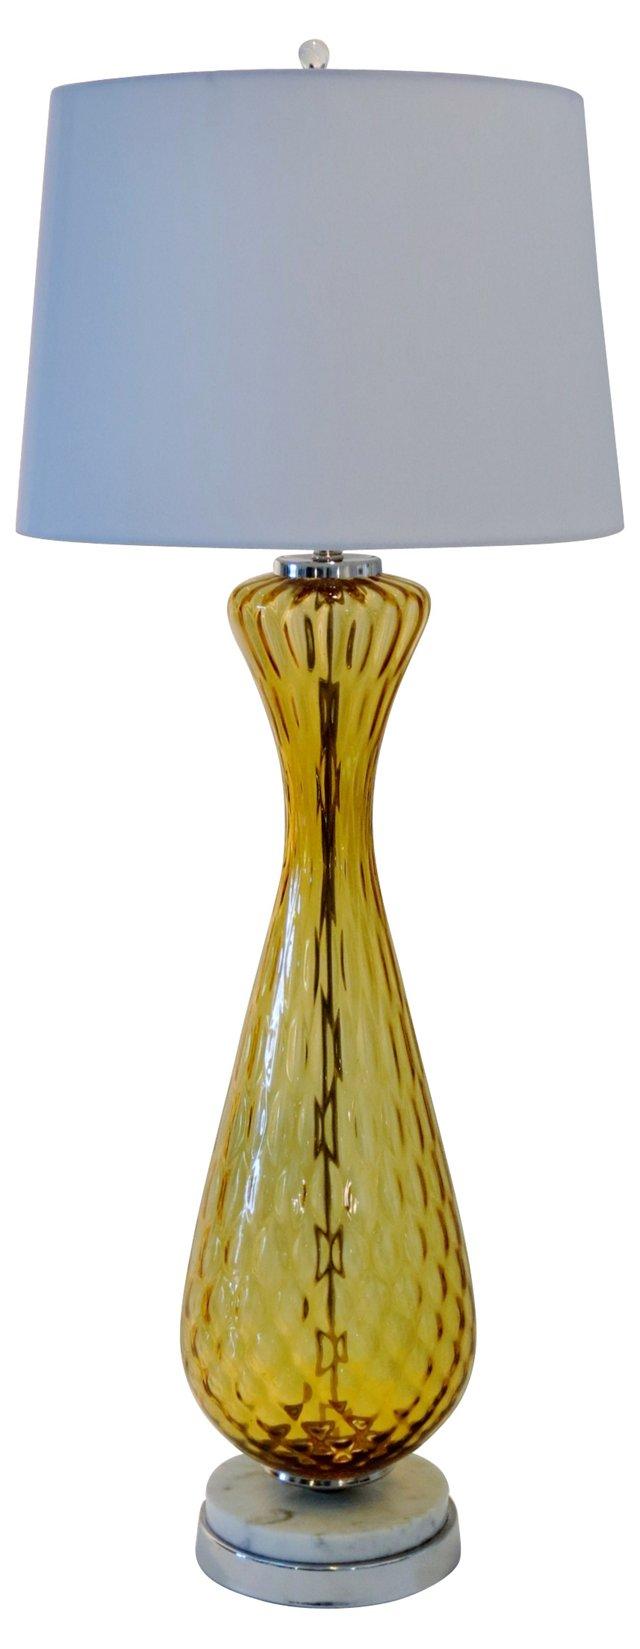 Gold Italian Murano Lamp